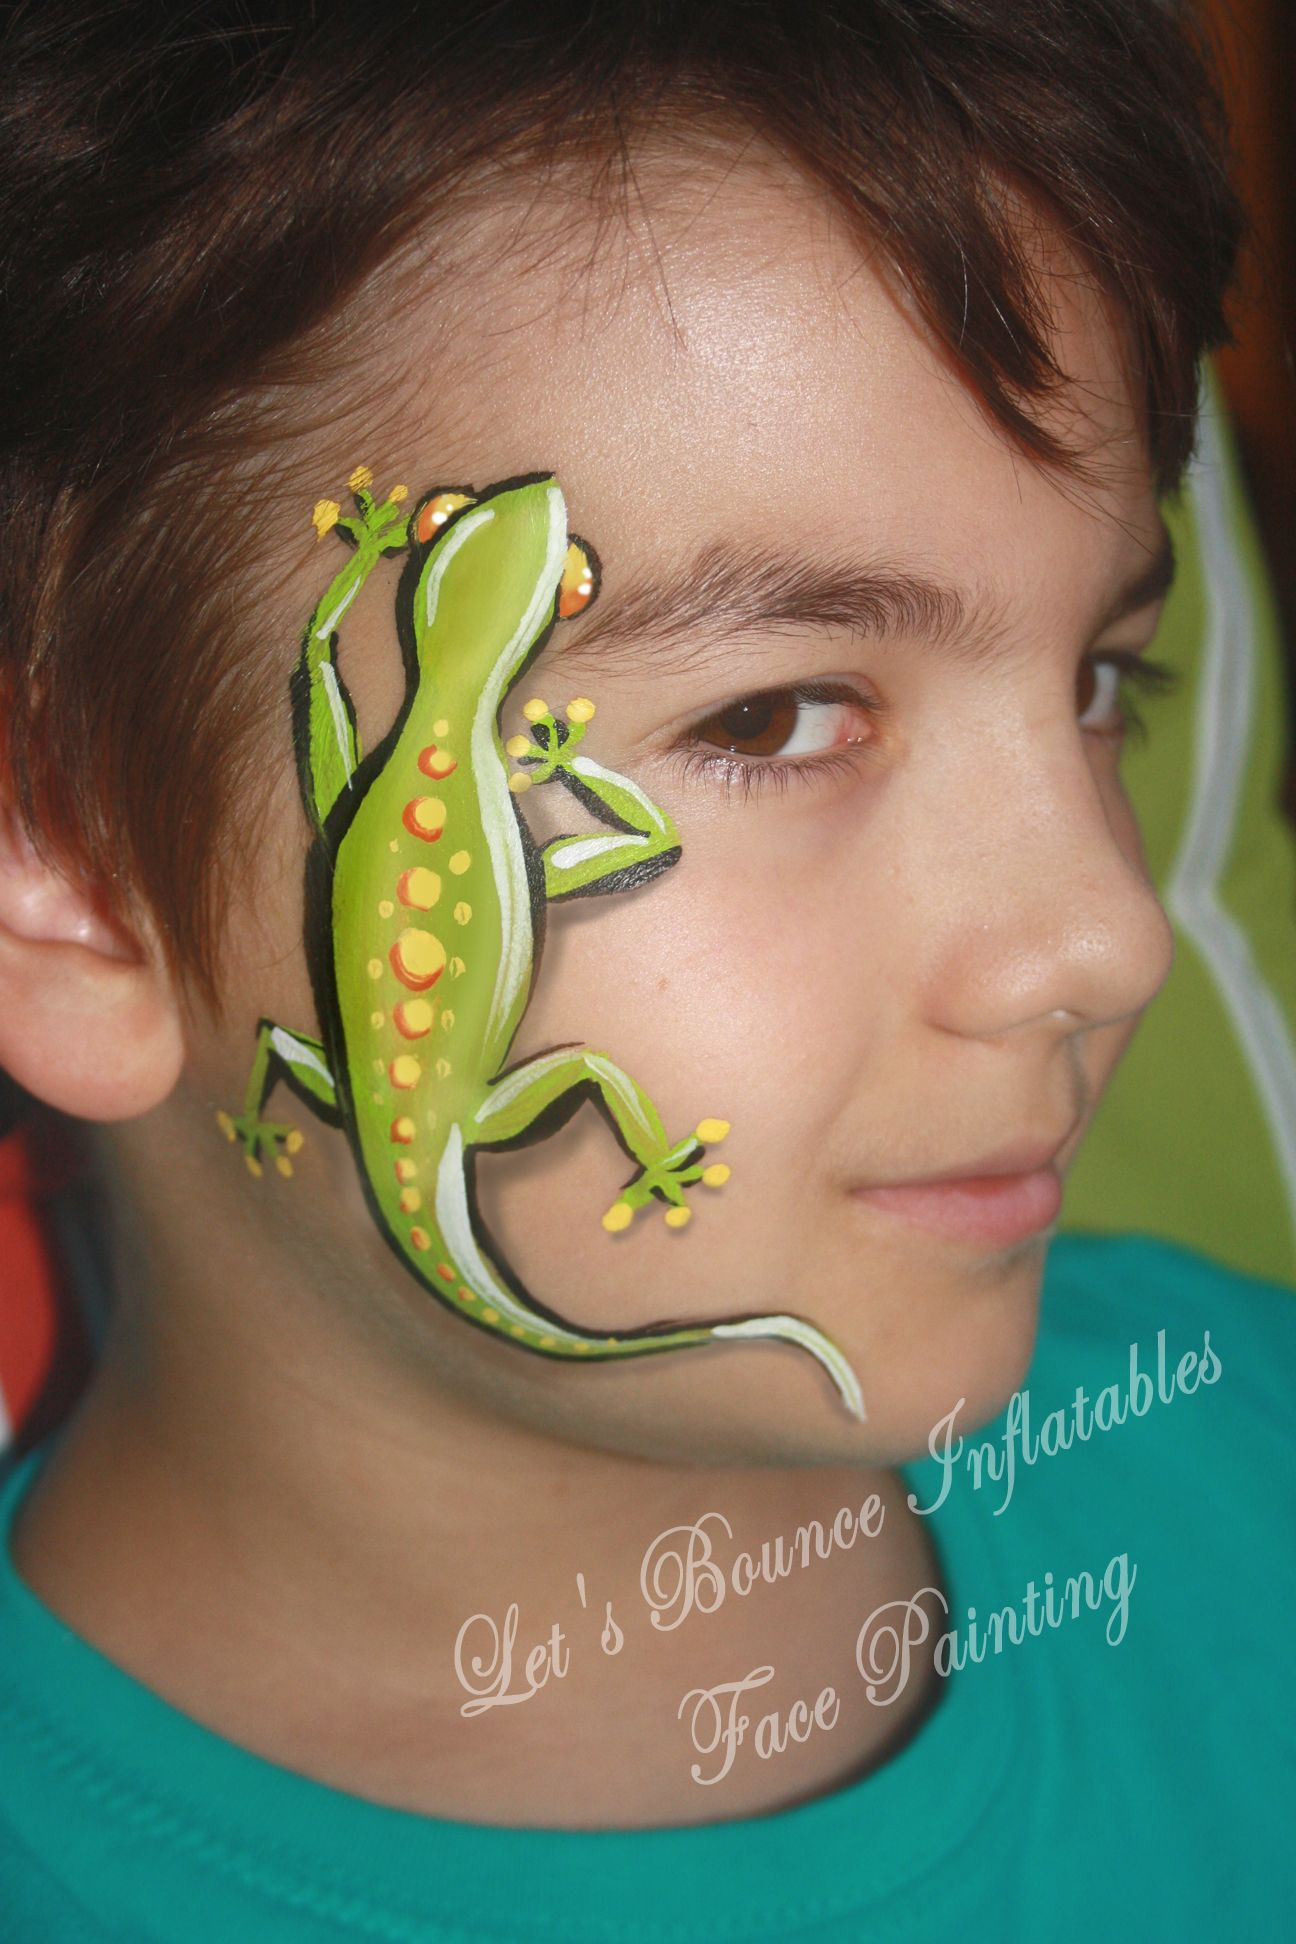 Gecko Face Paint : gecko, paint, Ideeën, Kindergrime:, Reptielen/, Slang/, Krokodil, Schminken,, Schminken, Ontwerpen,, Reptielen